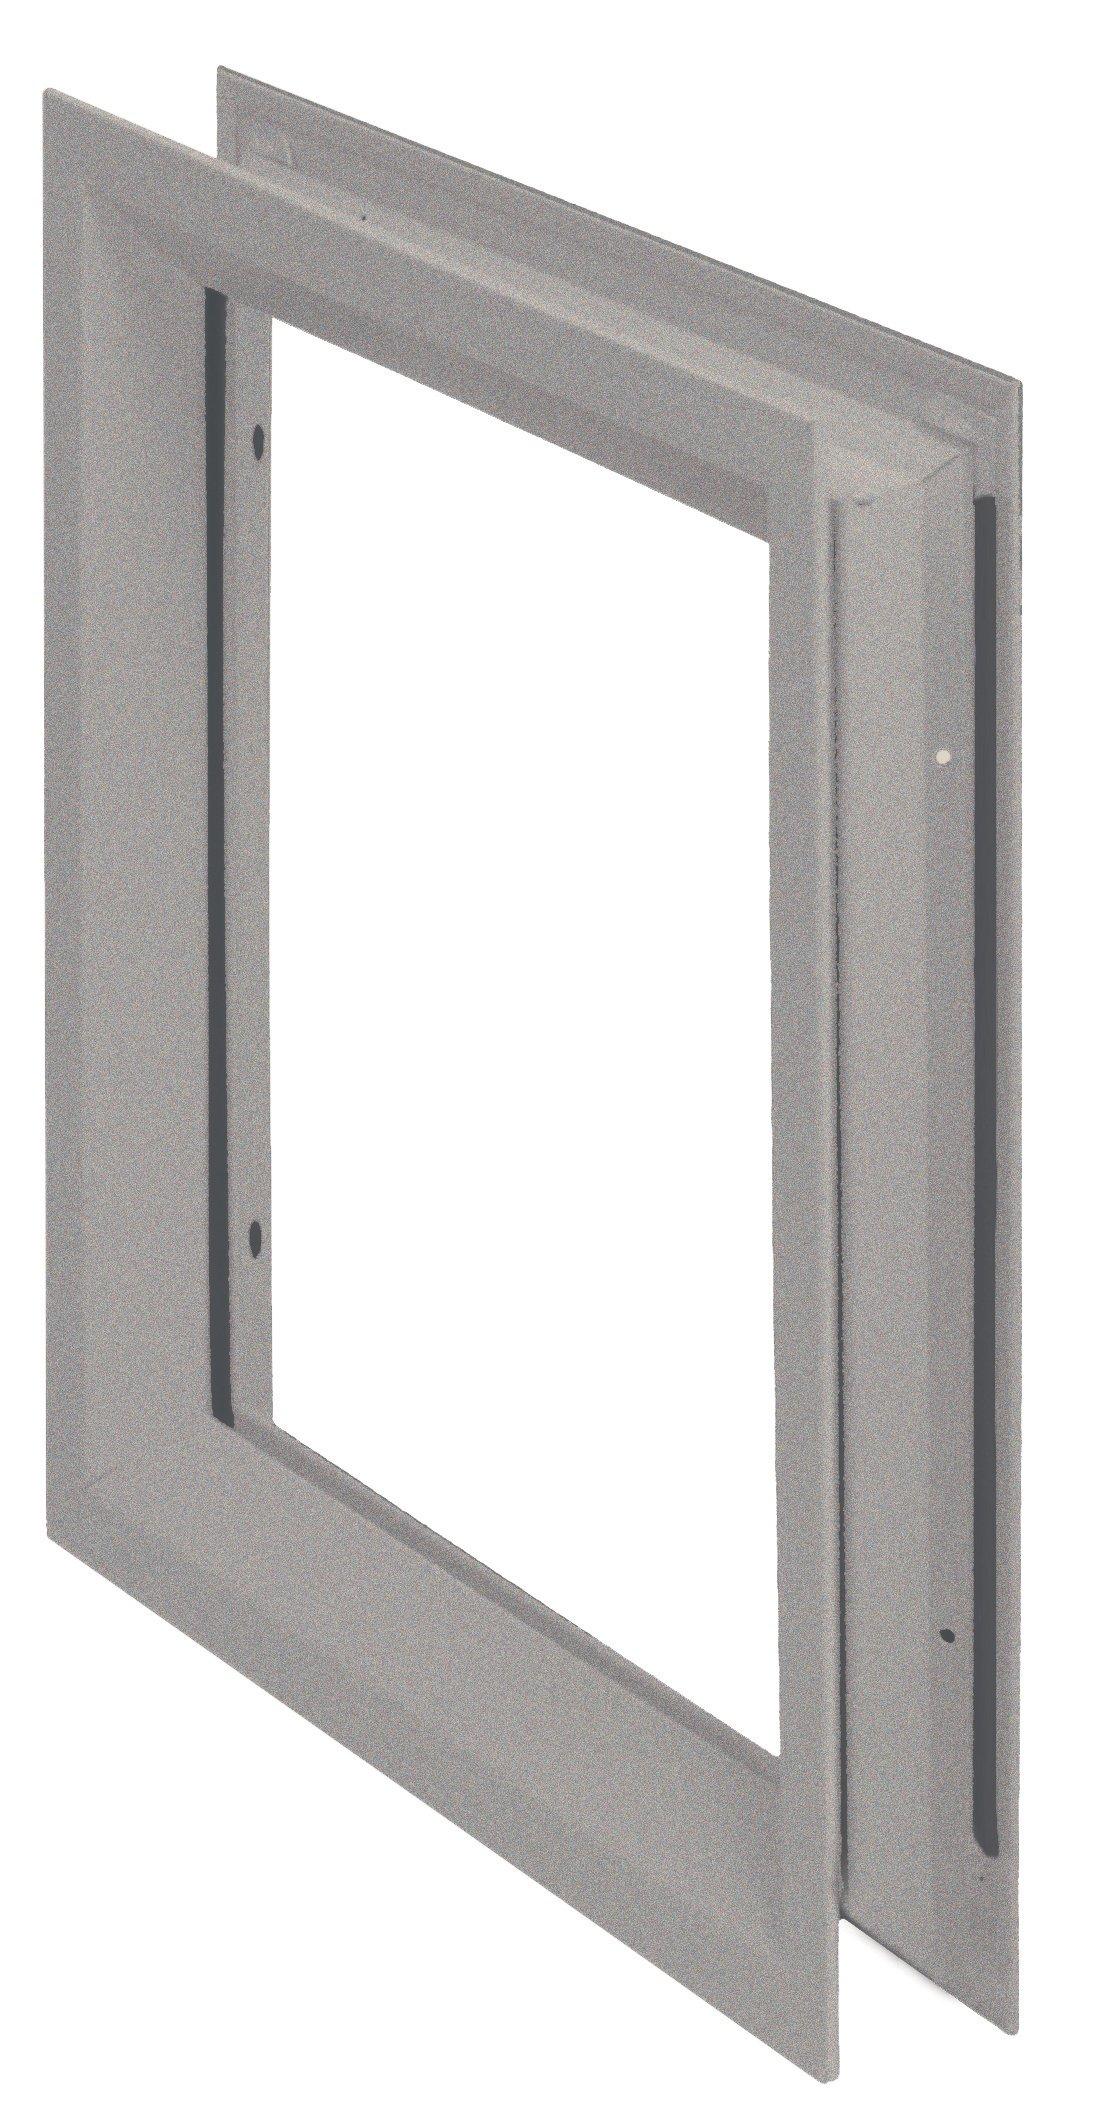 "National Guard LFRA100722  NGP Low Profile Vision Lite Kit for Door Opening Cutout, 7"" x 22"""